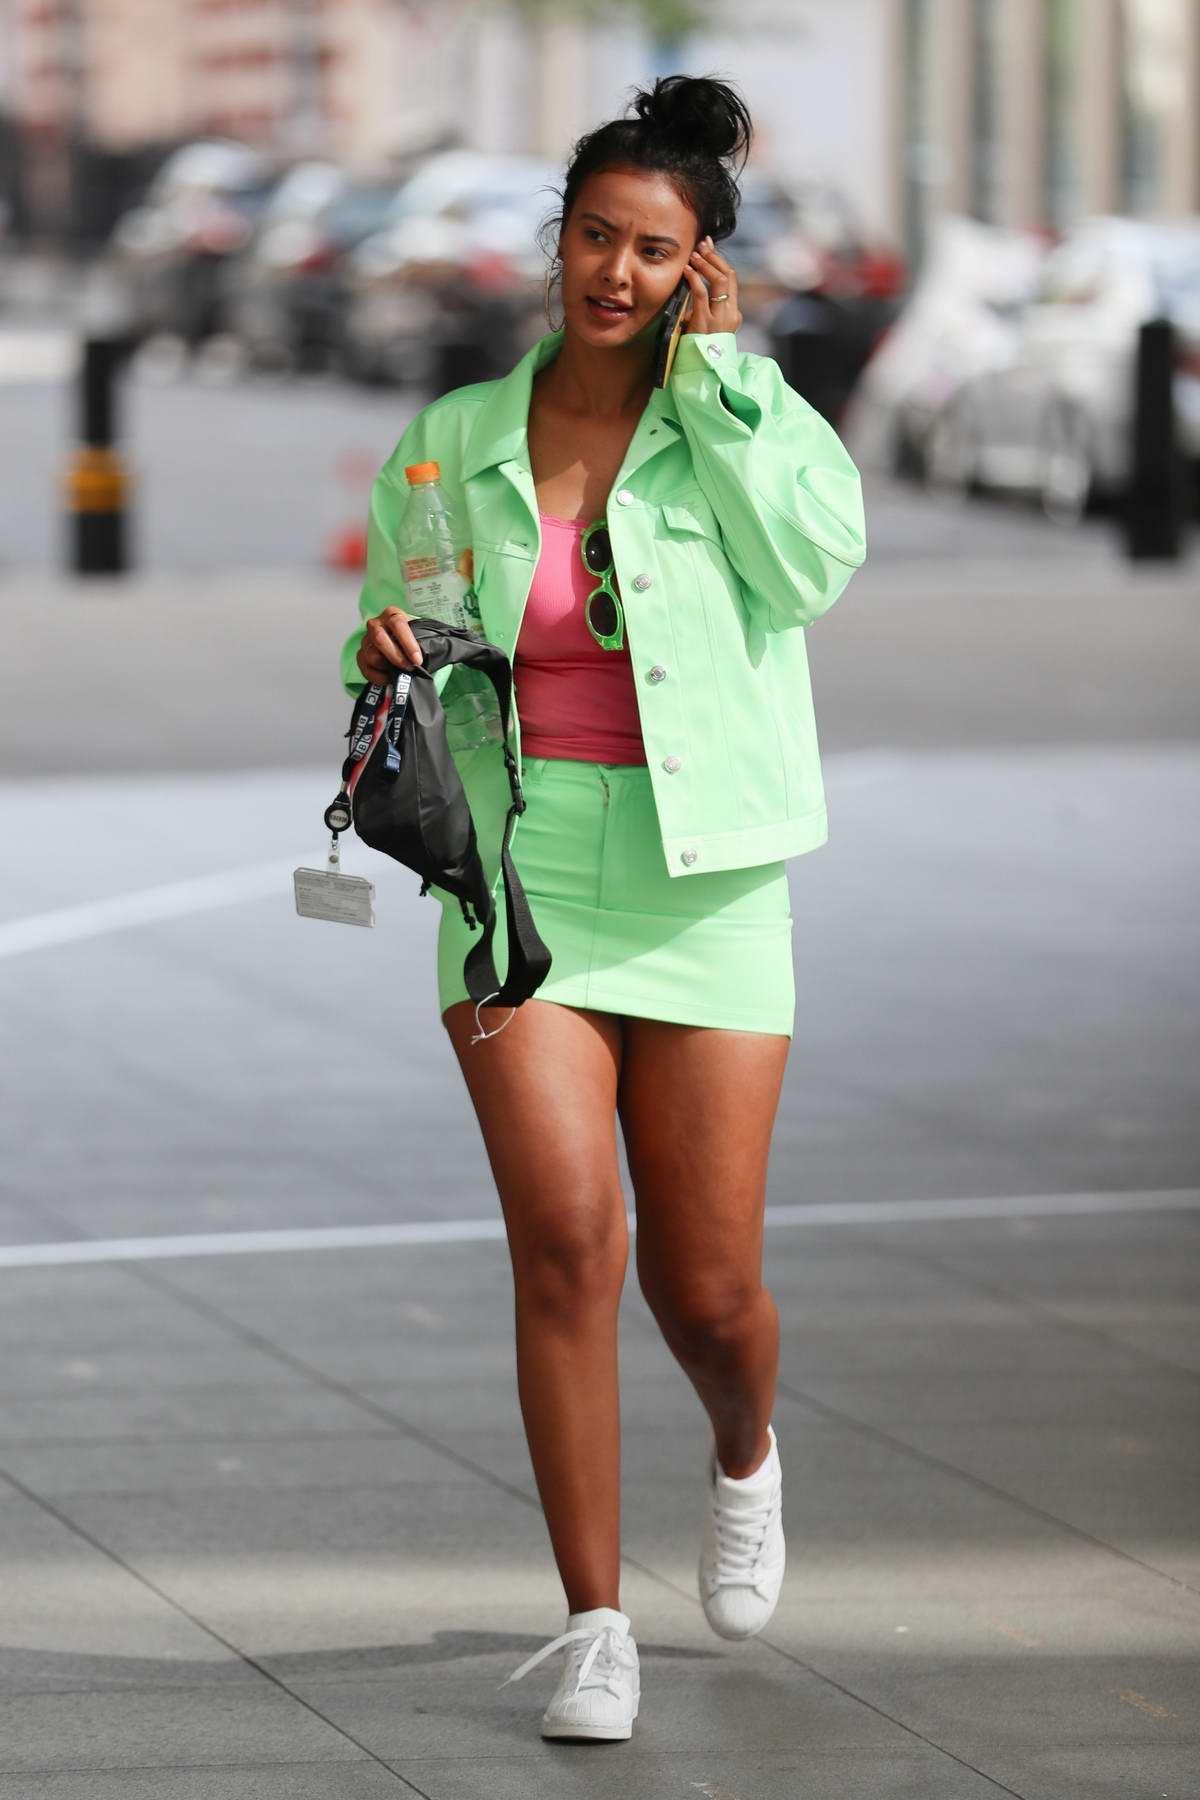 Maya Jama flaunts her legs in mint-green miniskirt while leaving BBC Radio One in London, UK